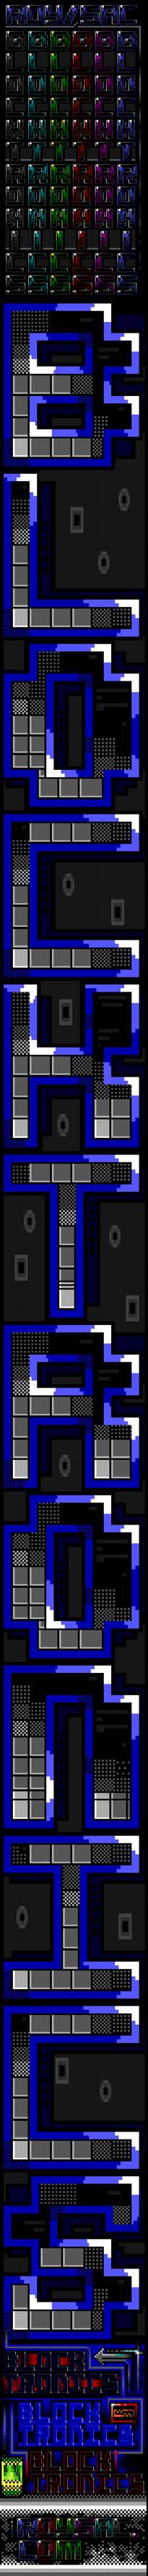 Blocktronics 5